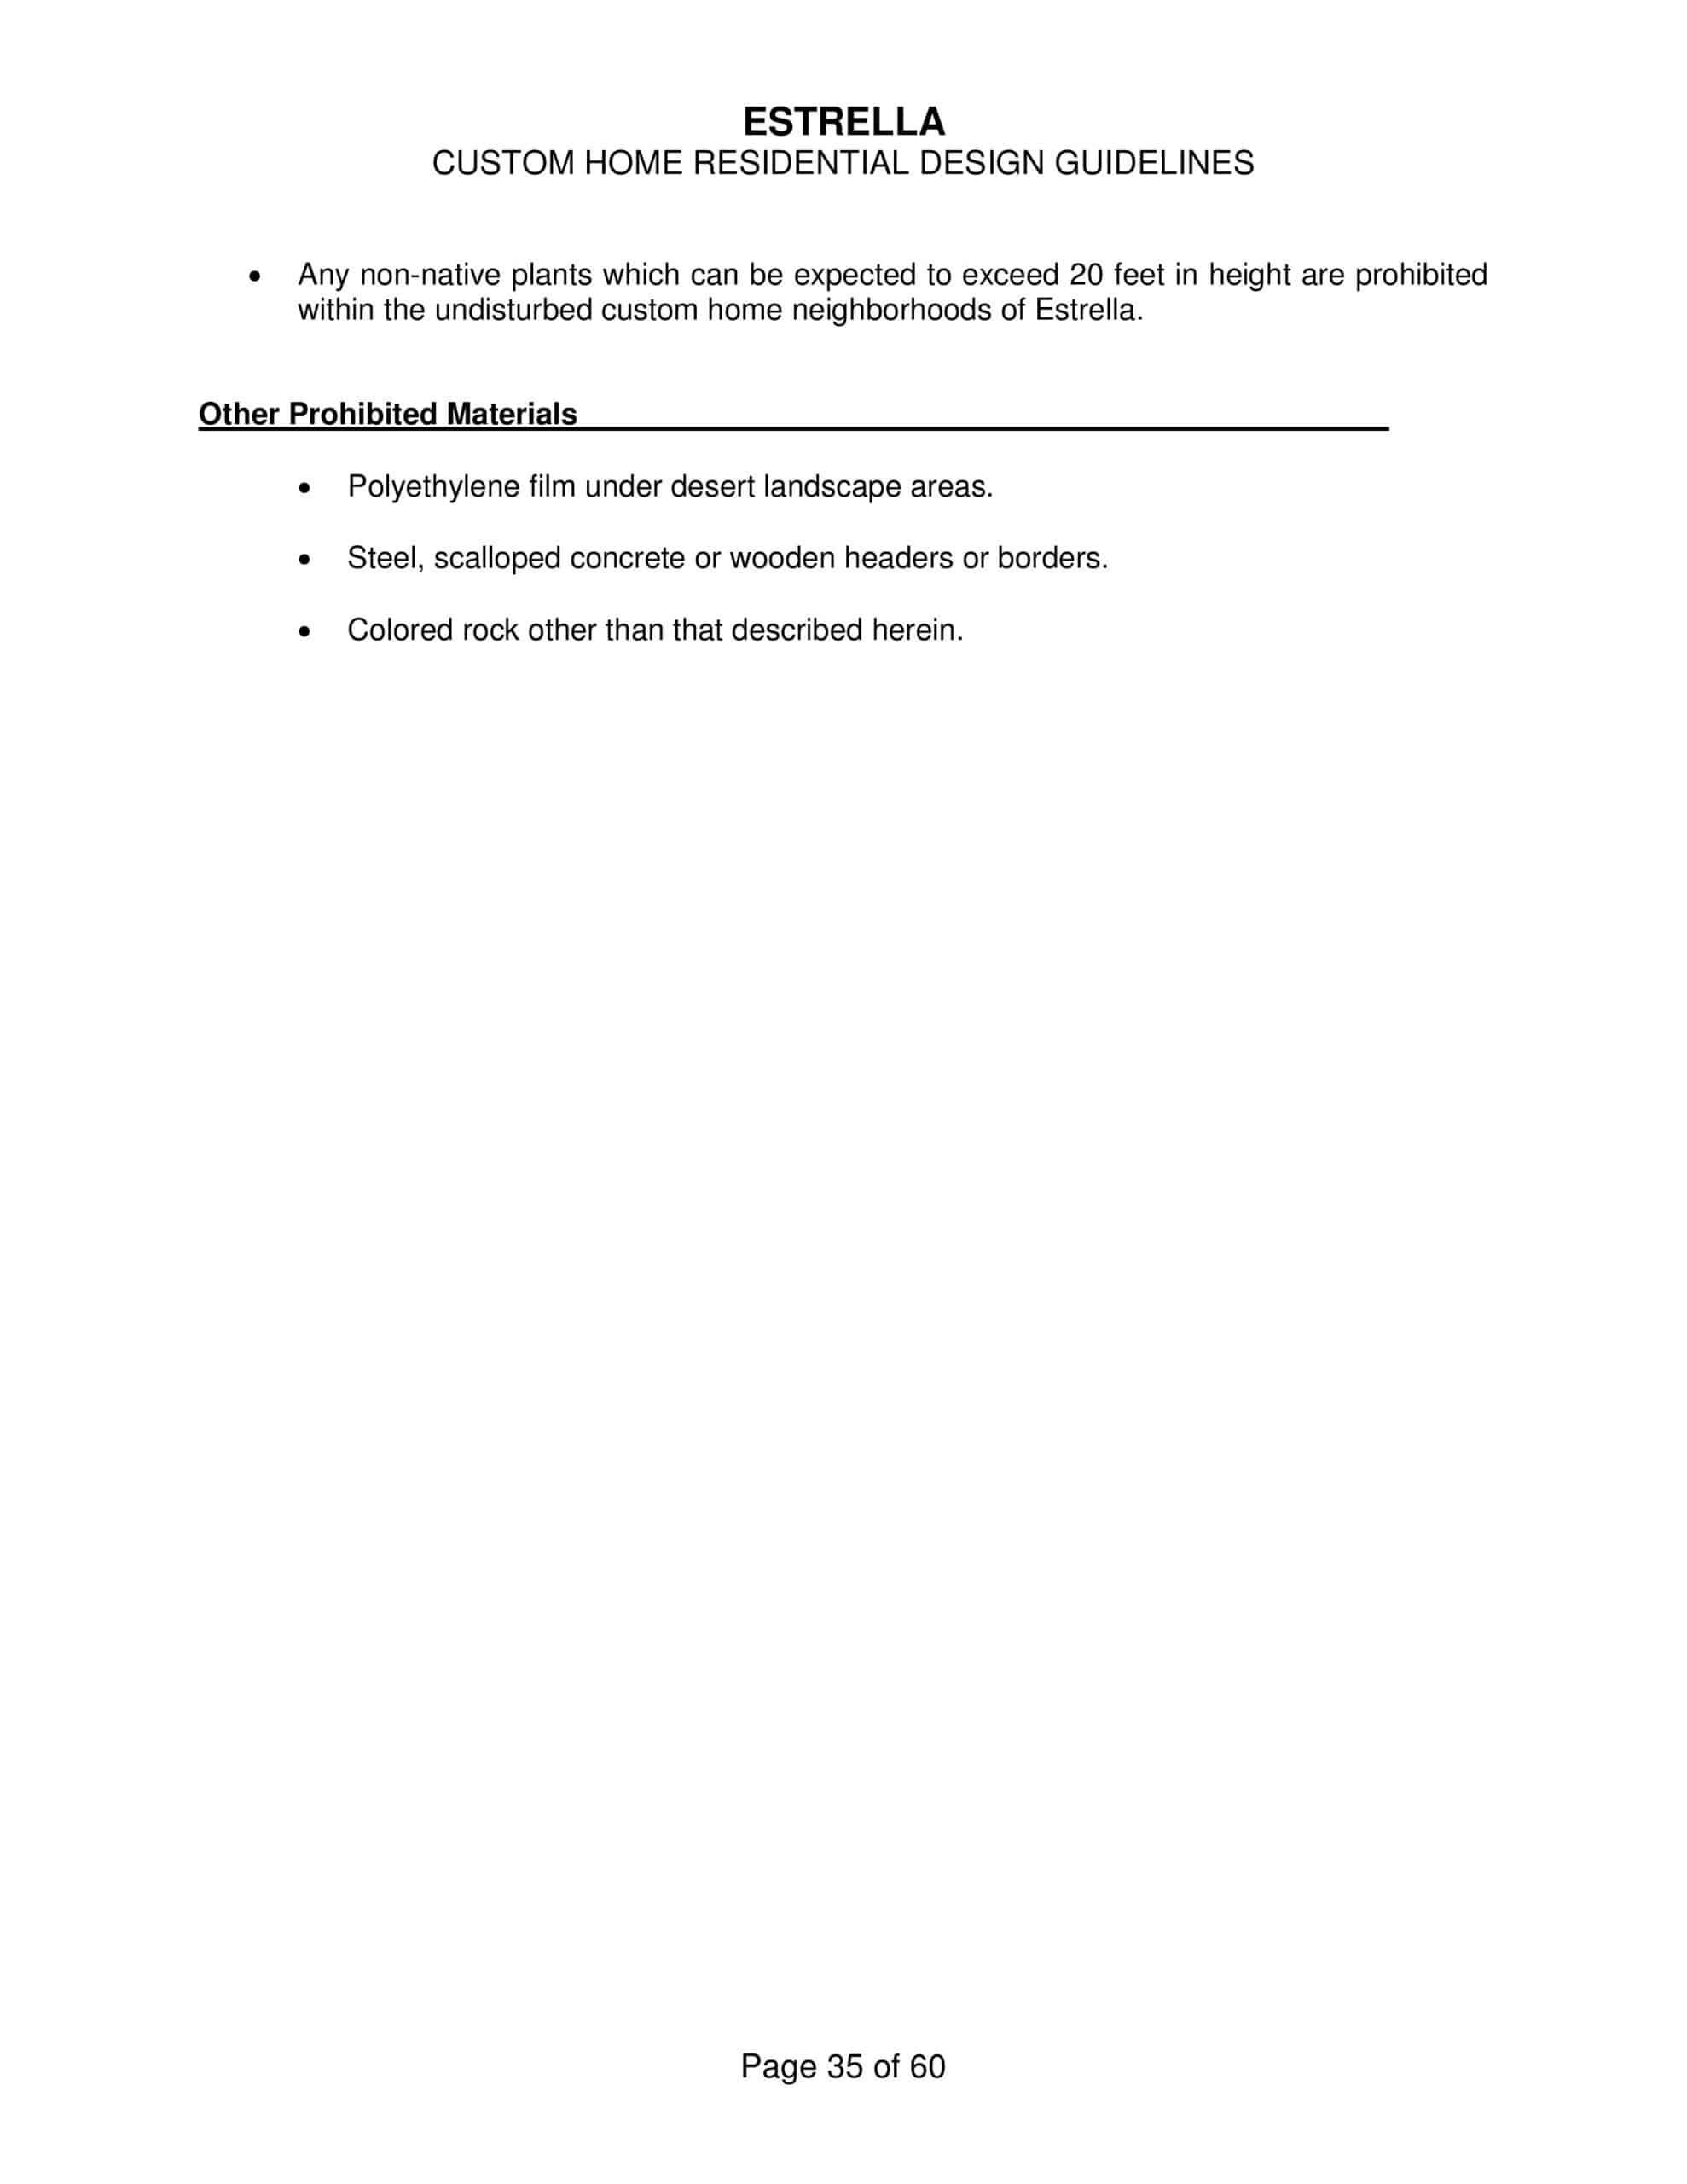 ESTRELLA MOUNTAIN CUSTOM HOME GUIDELINES-page-039